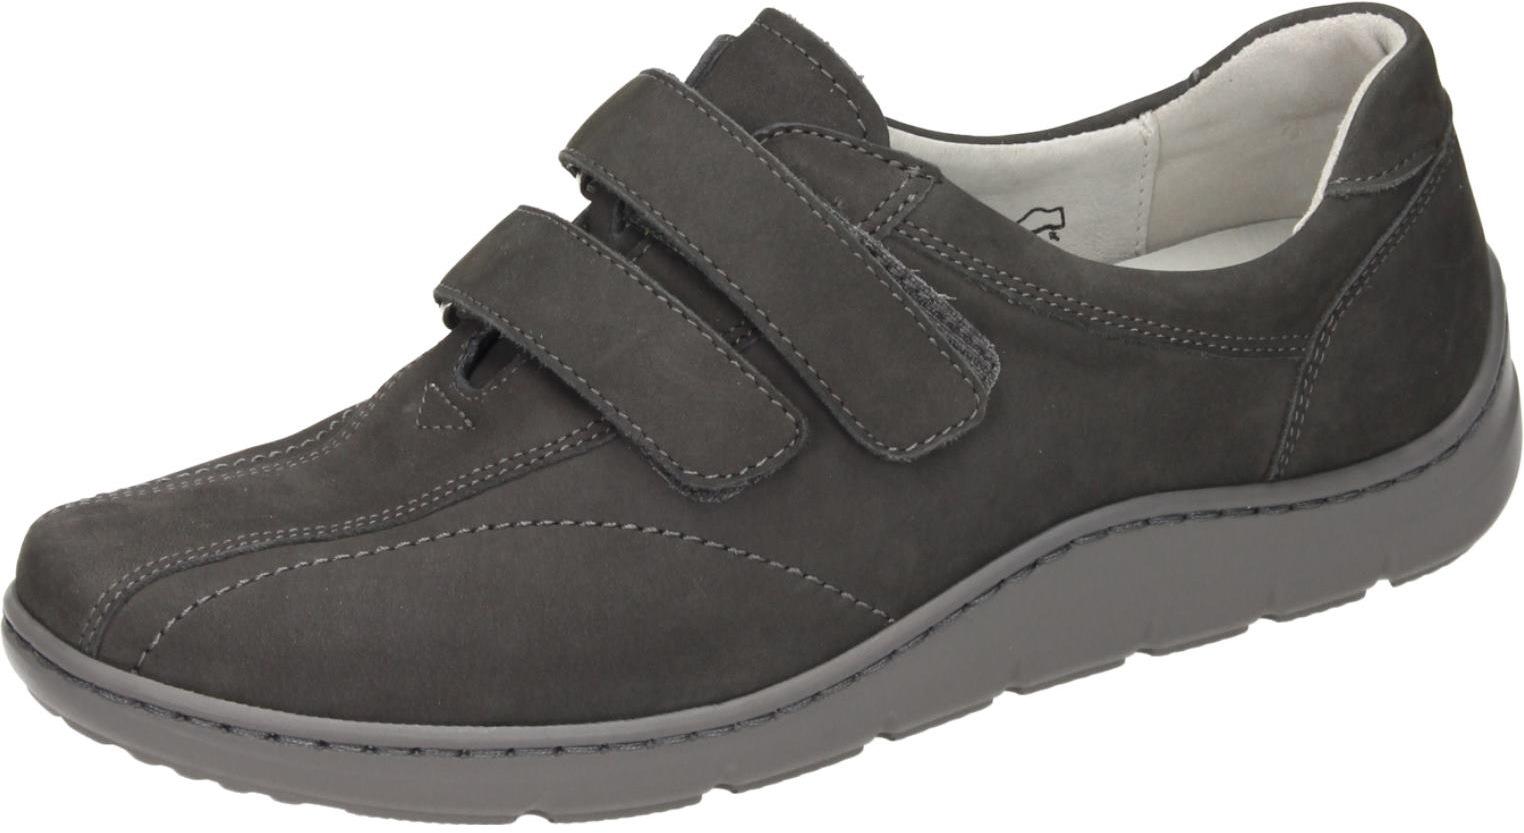 Waldläufer Damen Schuhe Damen-Slipper - H grau grau grau Nubukleder 942380 828137